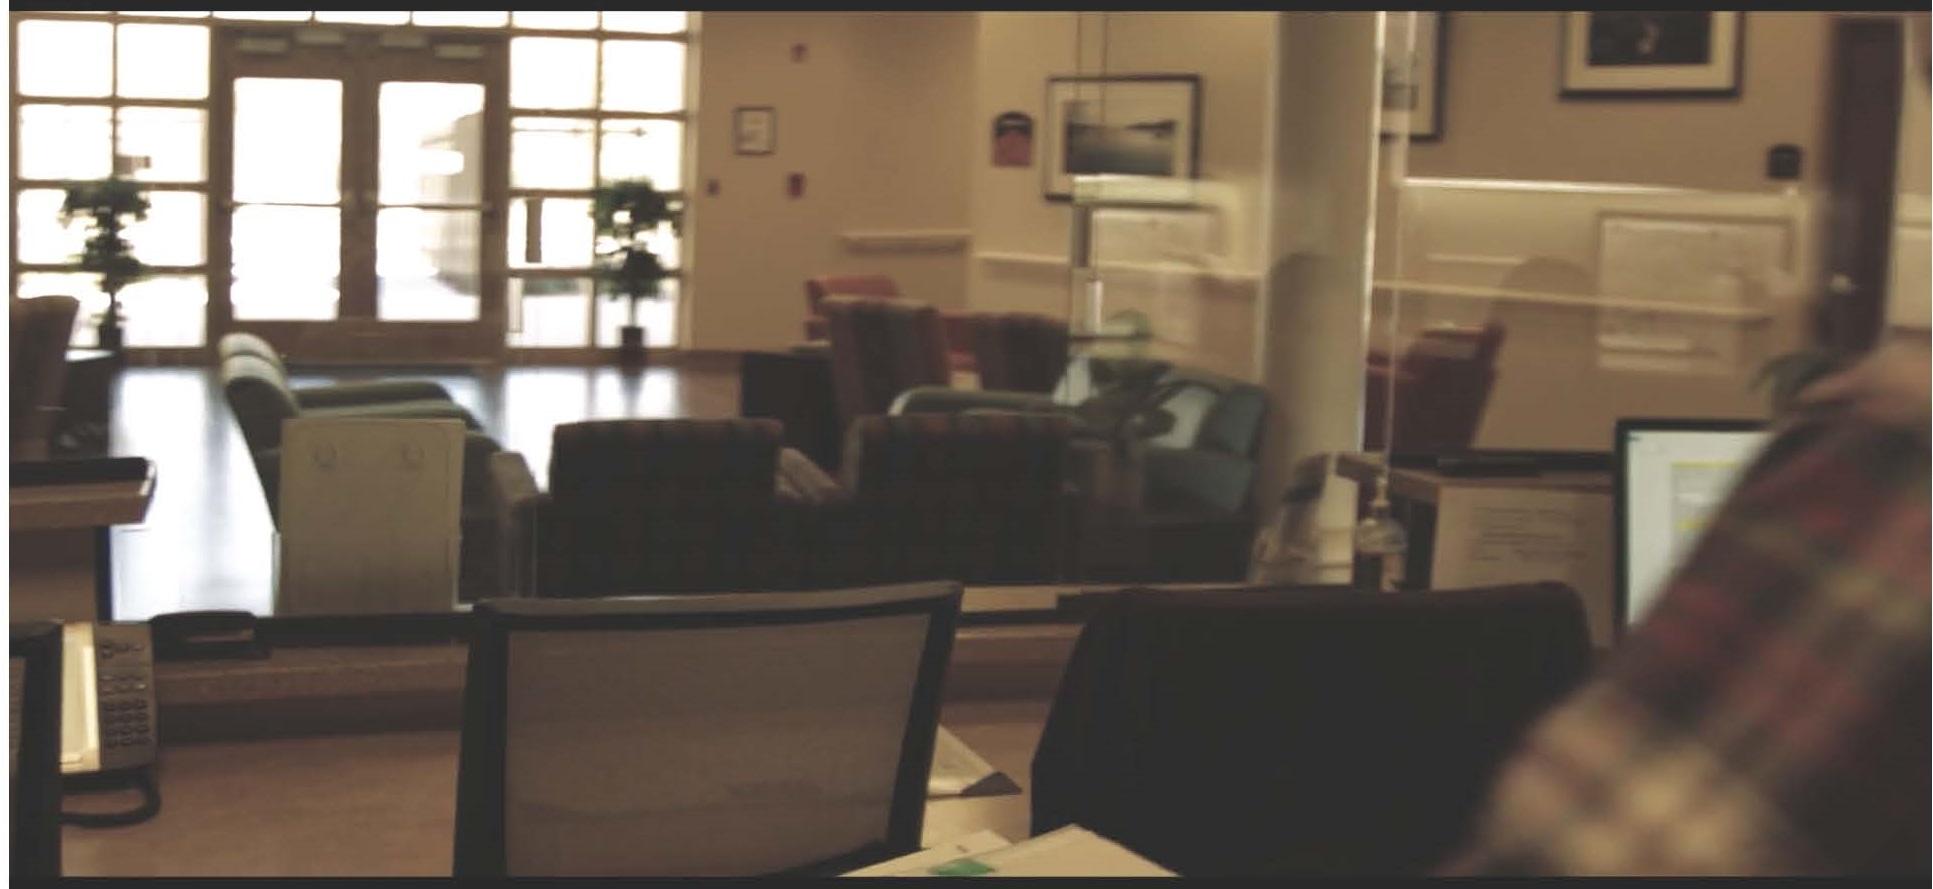 Mentis Neuro - El Paso Location Virtual Tour-HD on Vimeo14